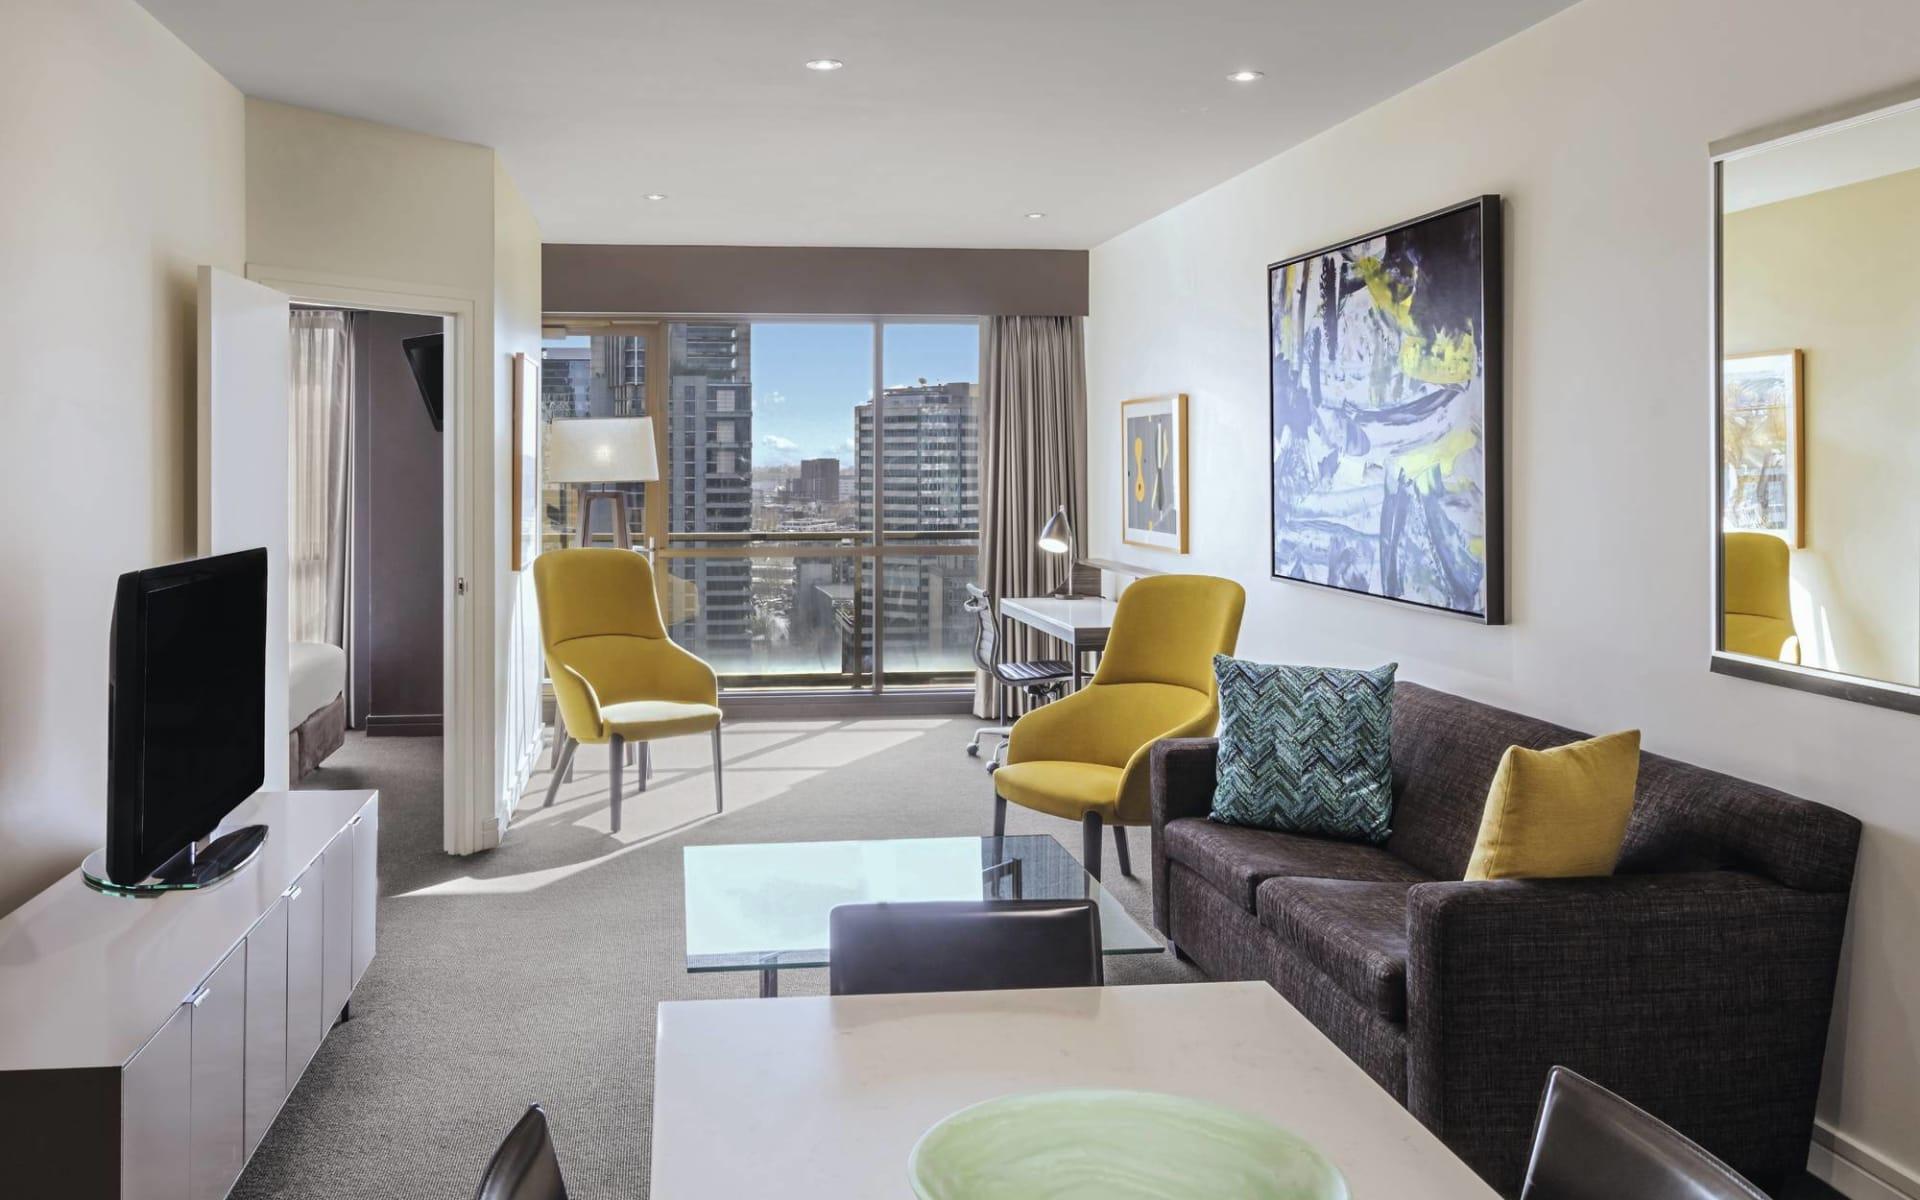 Adina Apartment Hotel Melbourne: Adina Apartment Hotel Melbourne - Two Bedroom Apartment Lounge 2017